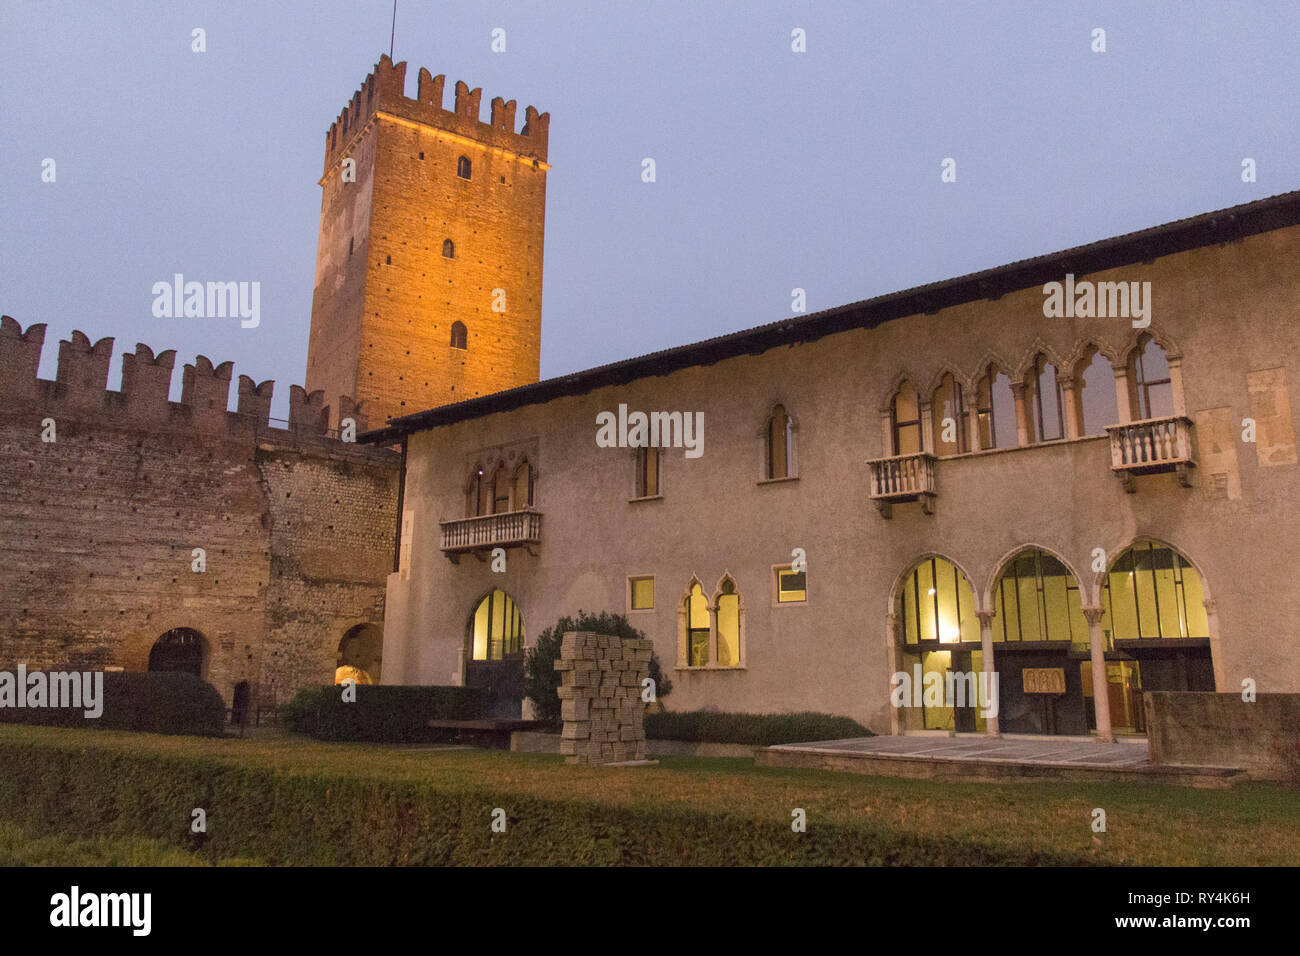 Italy, Verona - December 08 2017: the view of inner yard of Castelvecchio at night on December 08 2017, Veneto, Italy. - Stock Image